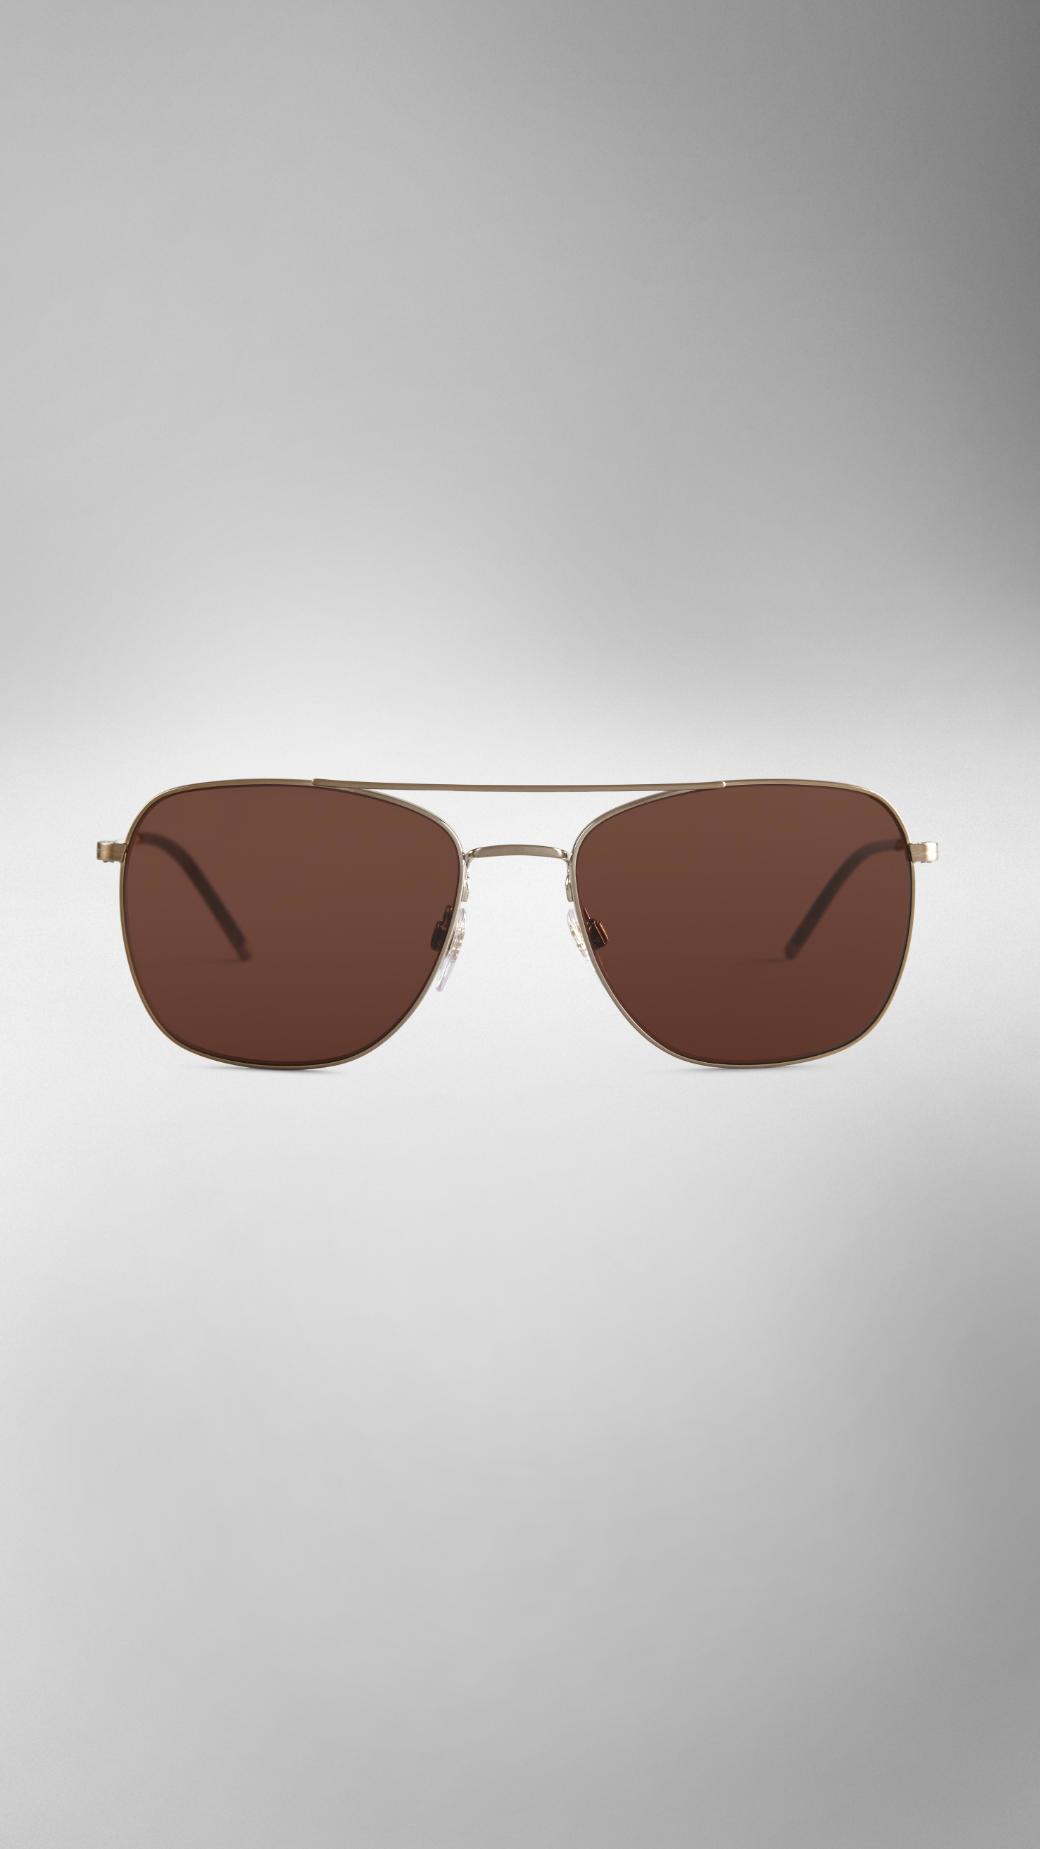 62b8ebadfae Burberry Check Arm Aviator Sunglasses in Brown for Men - Lyst